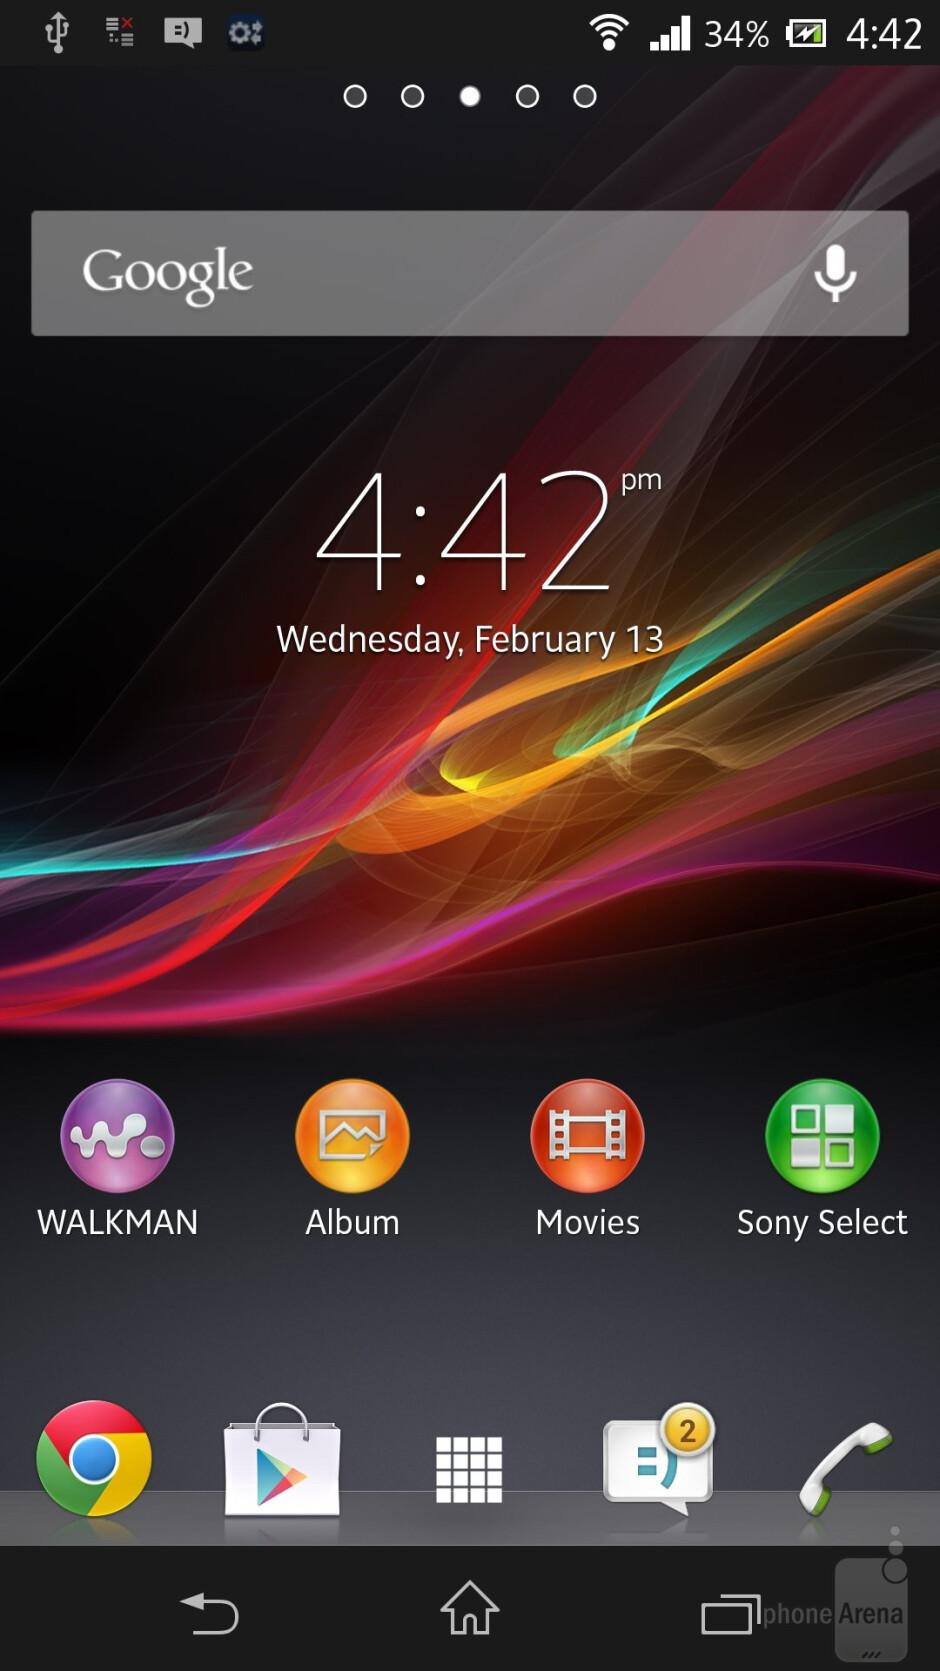 Sony Xperia Z comes straight with Android 4.1.2 Jelly Bean - Samsung Galaxy S4 vs Sony Xperia Z